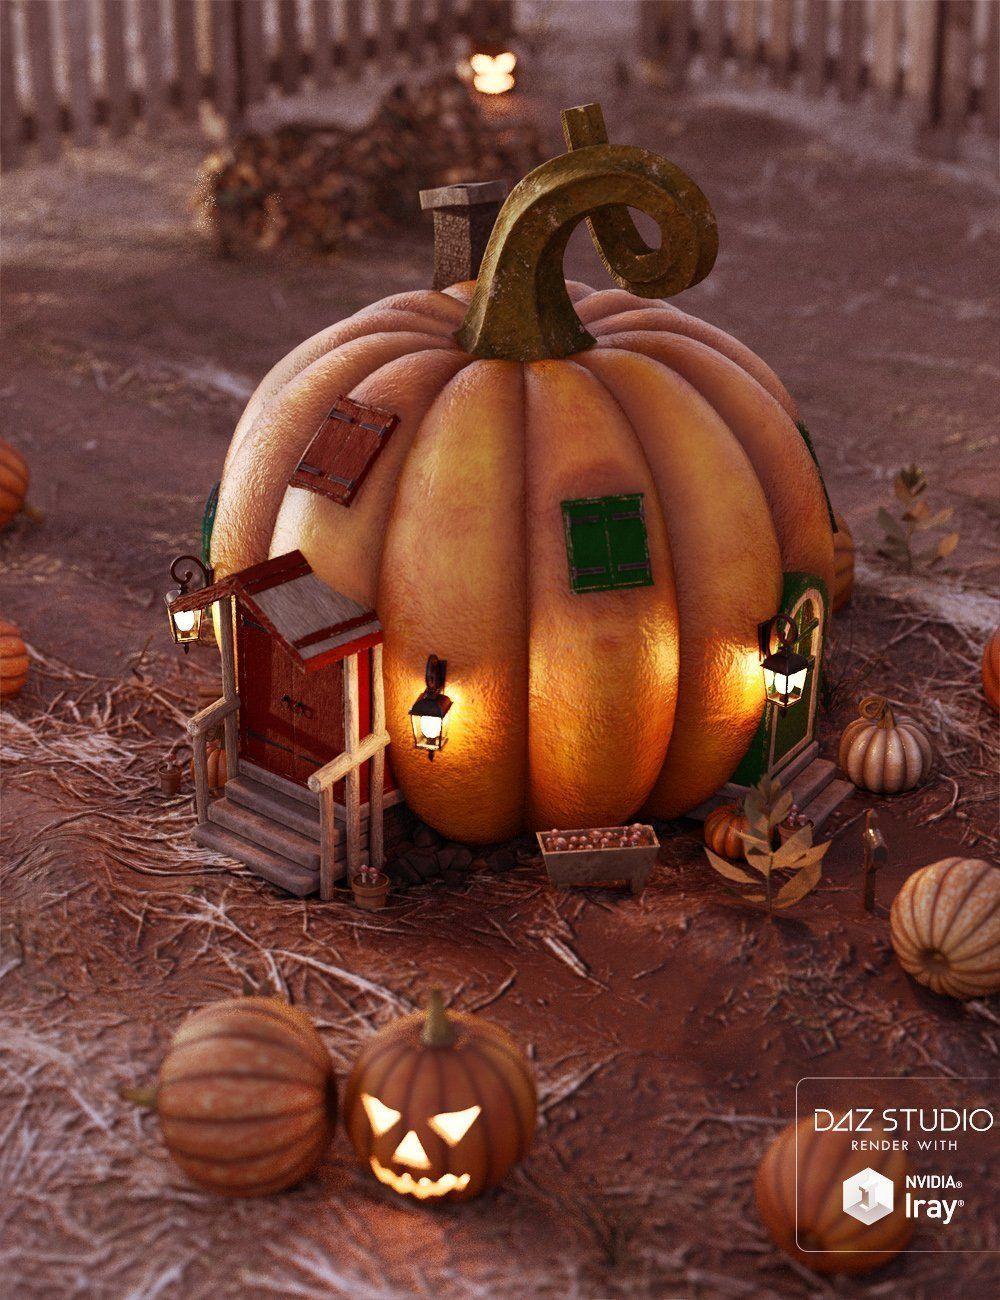 Iddy Biddy Pumpkin House